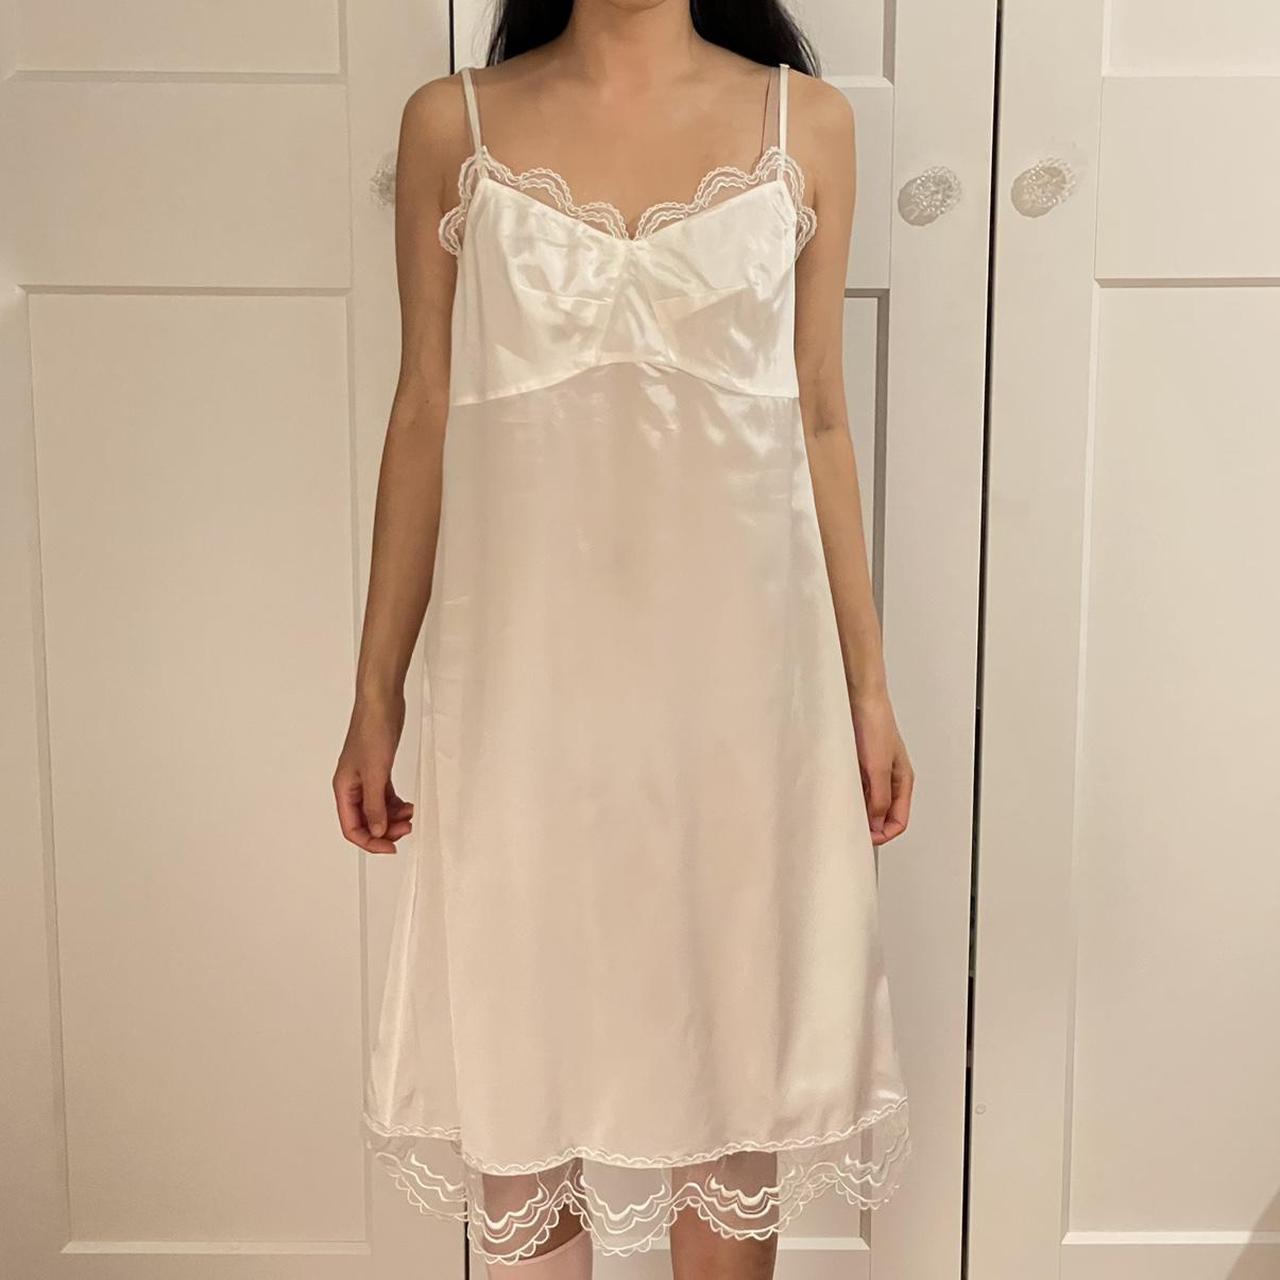 Product Image 1 - Simone Rocha FW19 pearly white